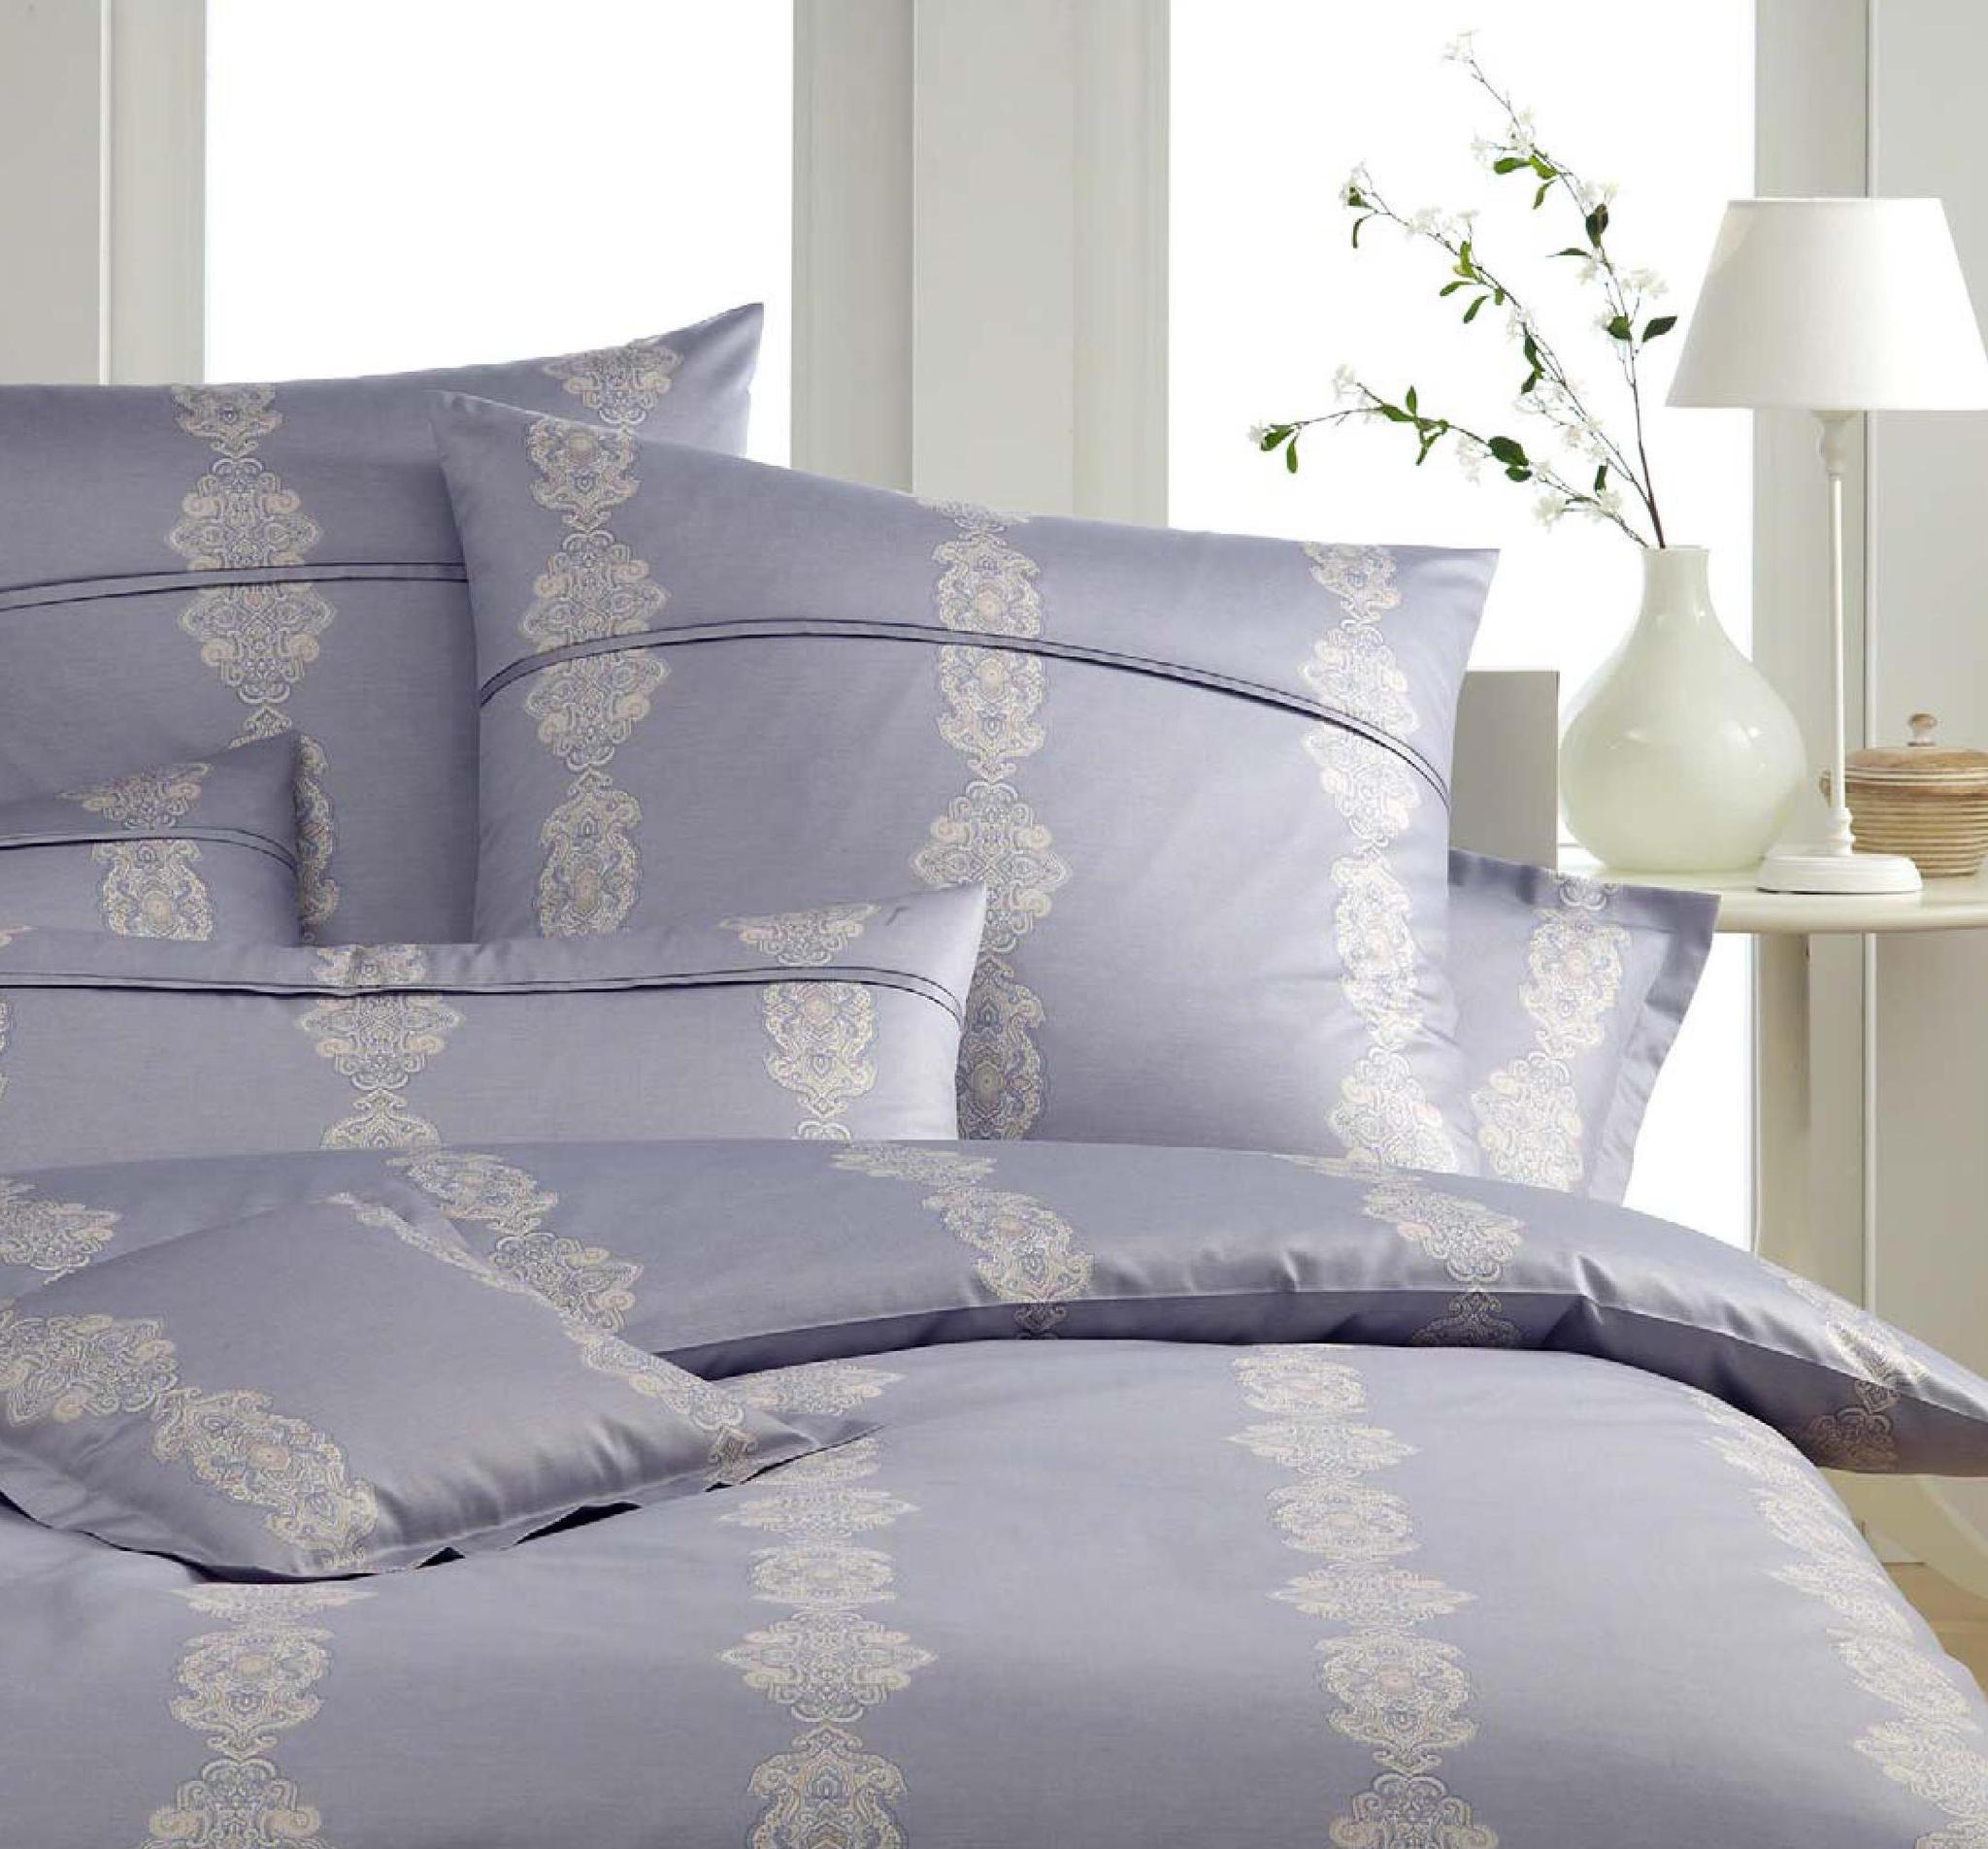 Для сна Наволочка 50x70 Elegante Levante серебро elitnaya-navolochka-levante-serebryanaya-ot-elegante-germaniya.jpg